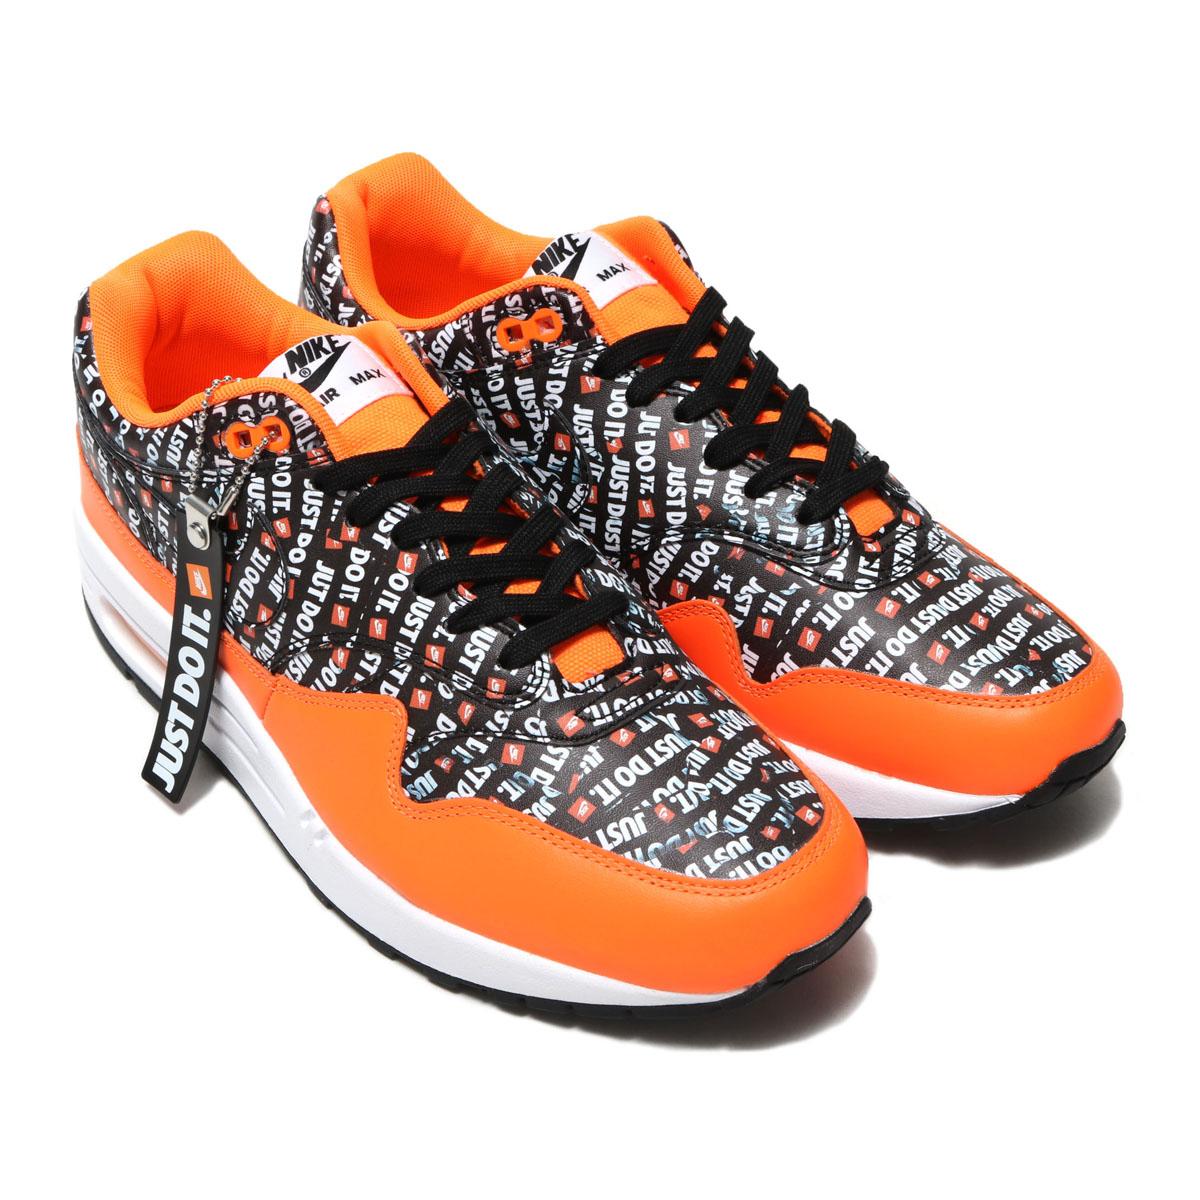 separation shoes 502fd 0bbde ... norway nike air max 1 premium kie ney amax 1 premium black black total  orange white